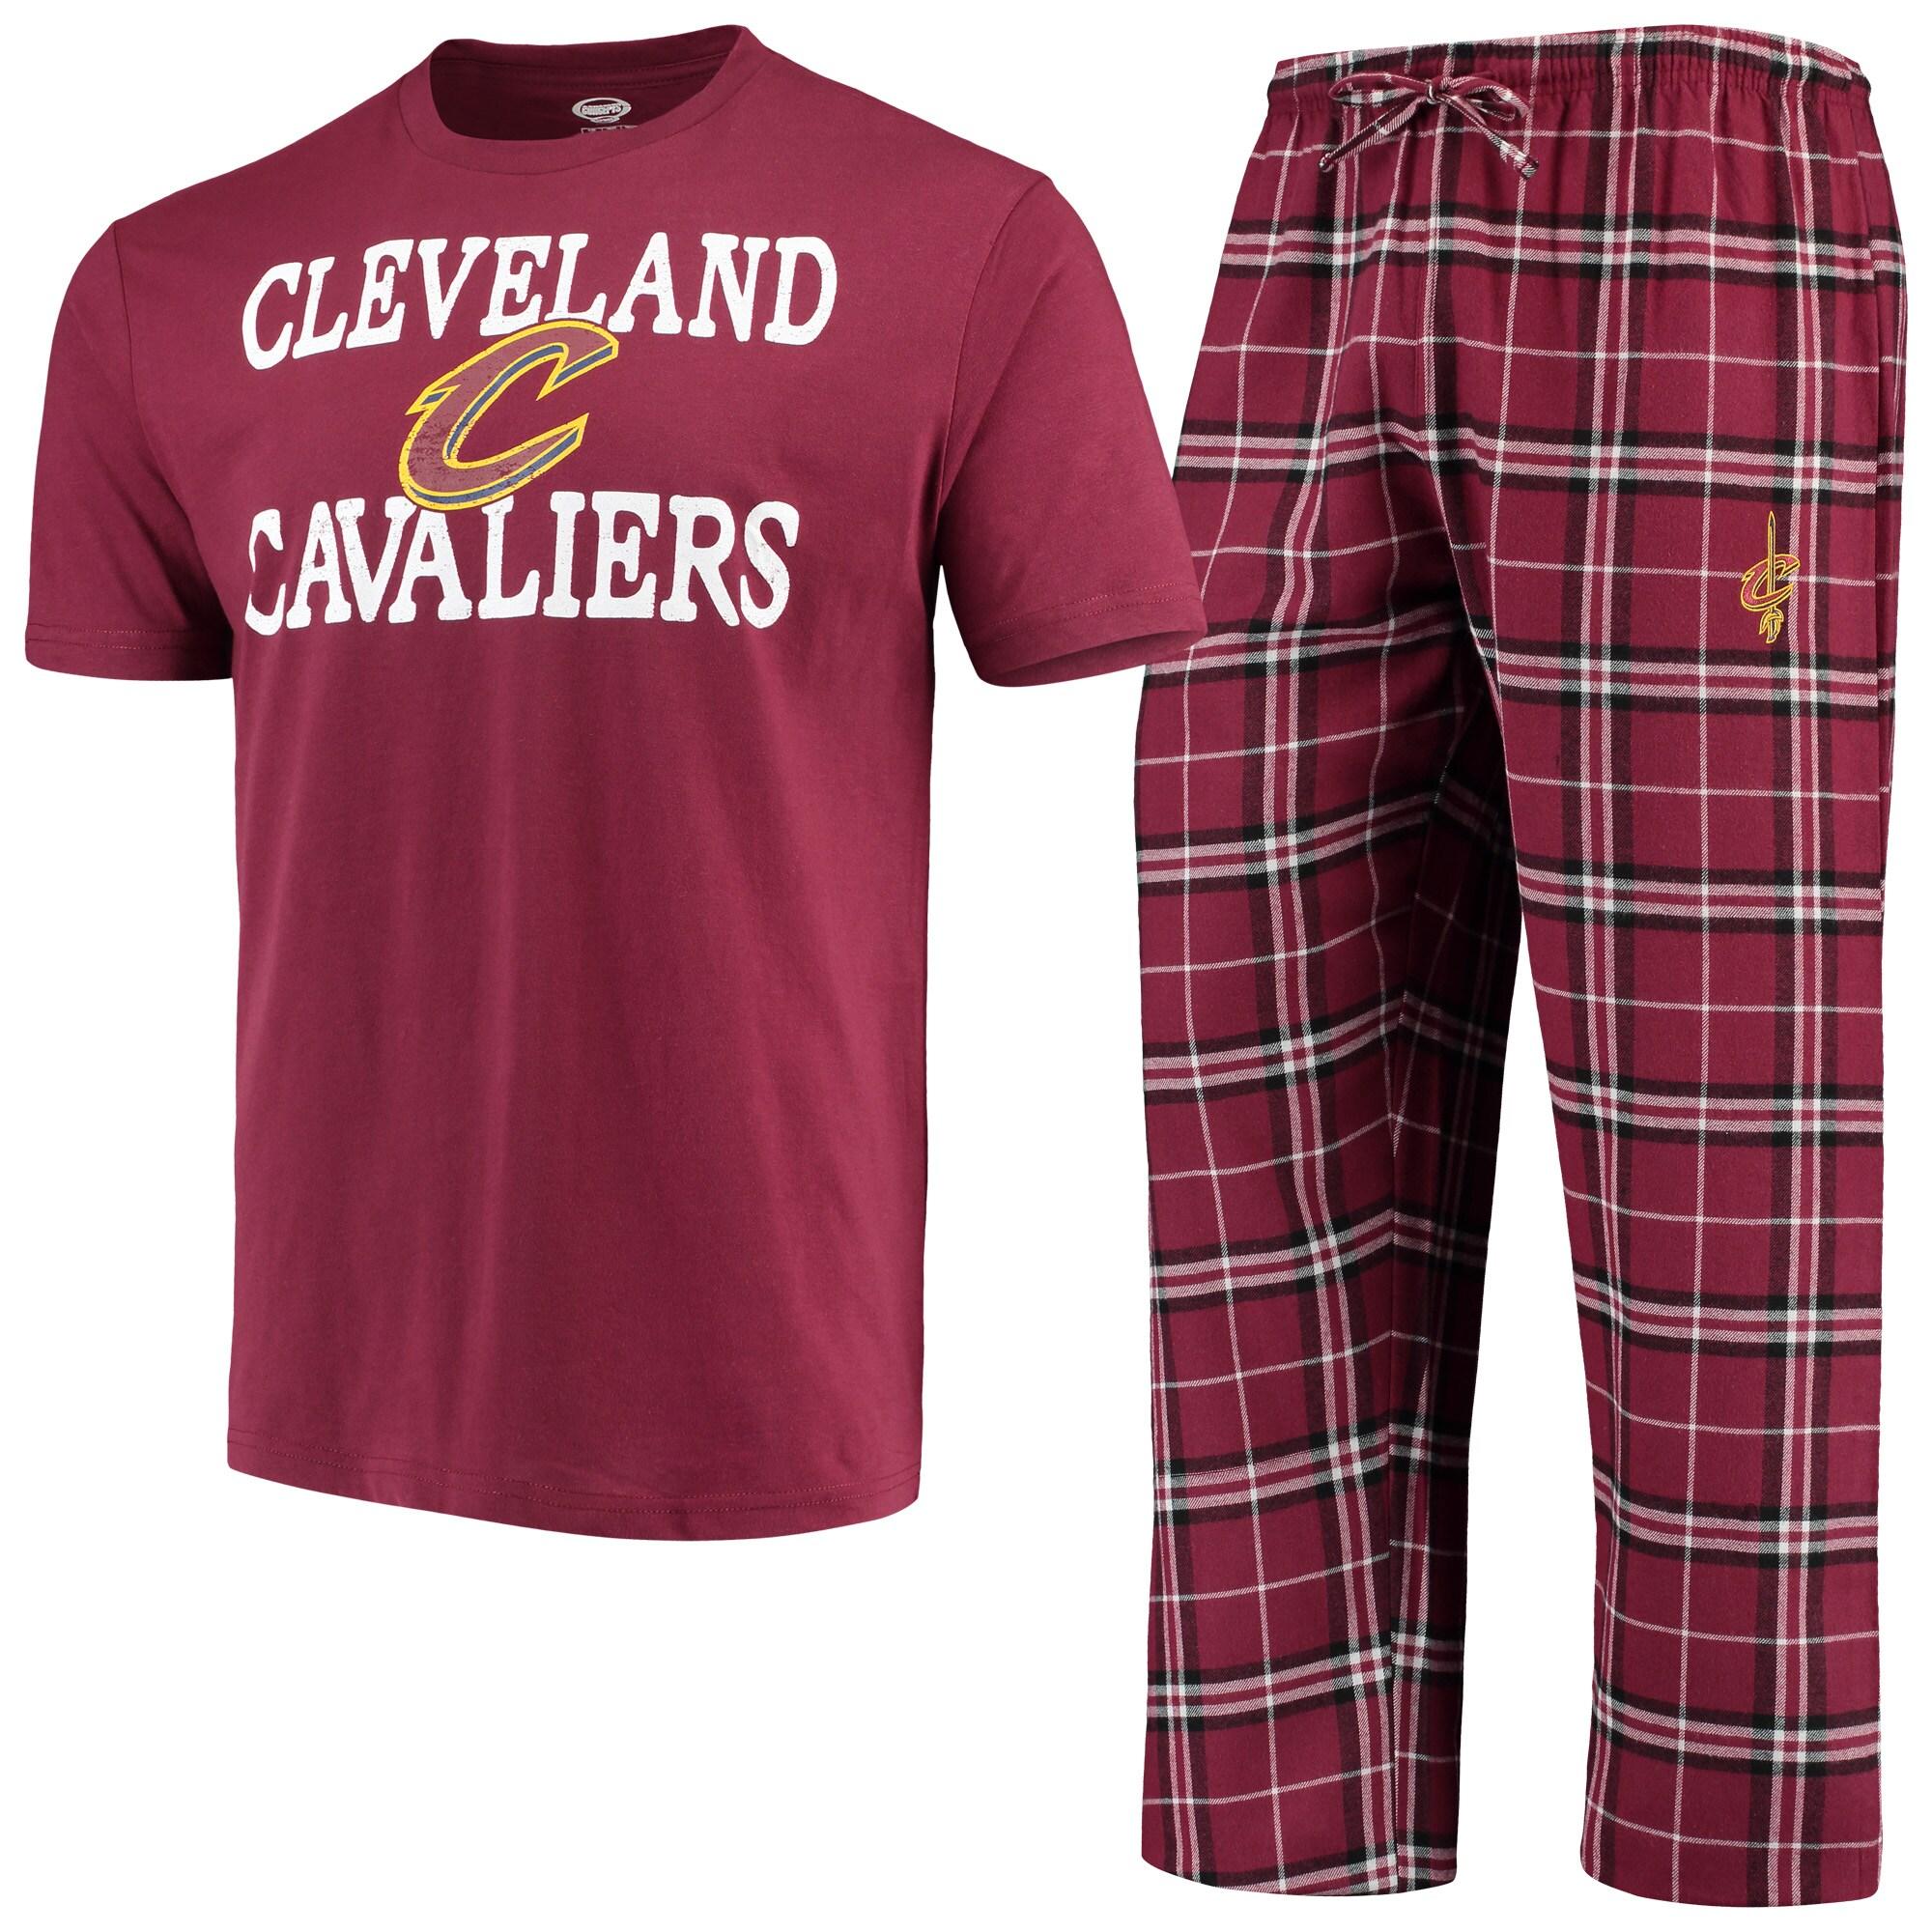 Cleveland Cavaliers Concepts Sport Duo T-Shirt & Pants Sleep Set - Wine/Black